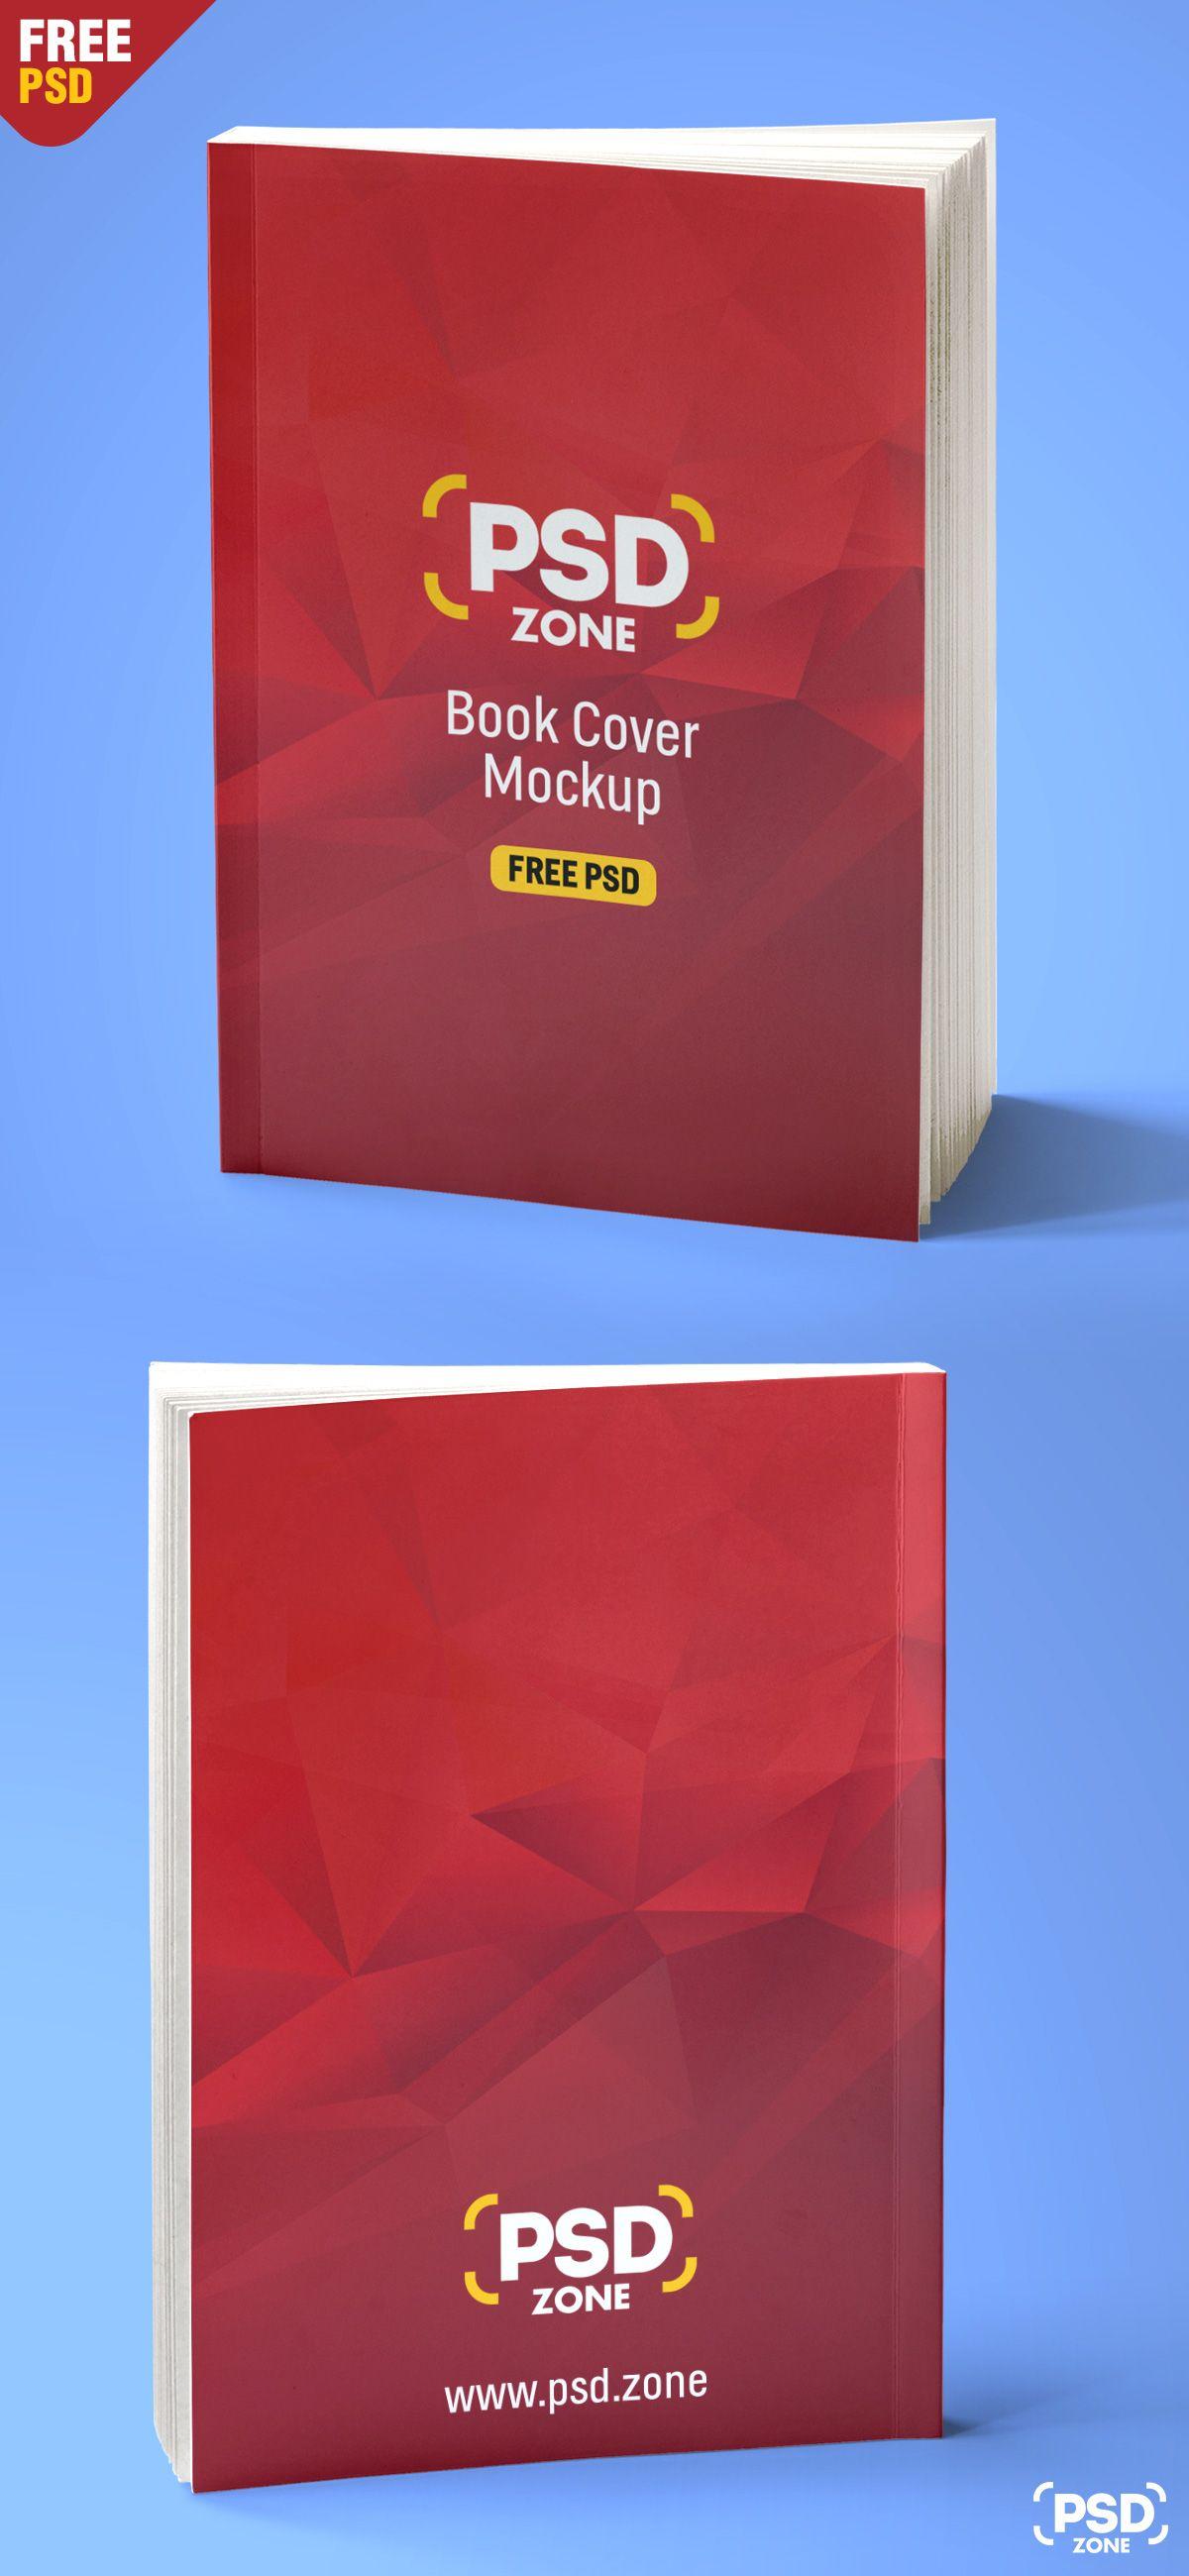 Realistic Book Mockup Free PSD | Presentation mockups (free) | Pinterest